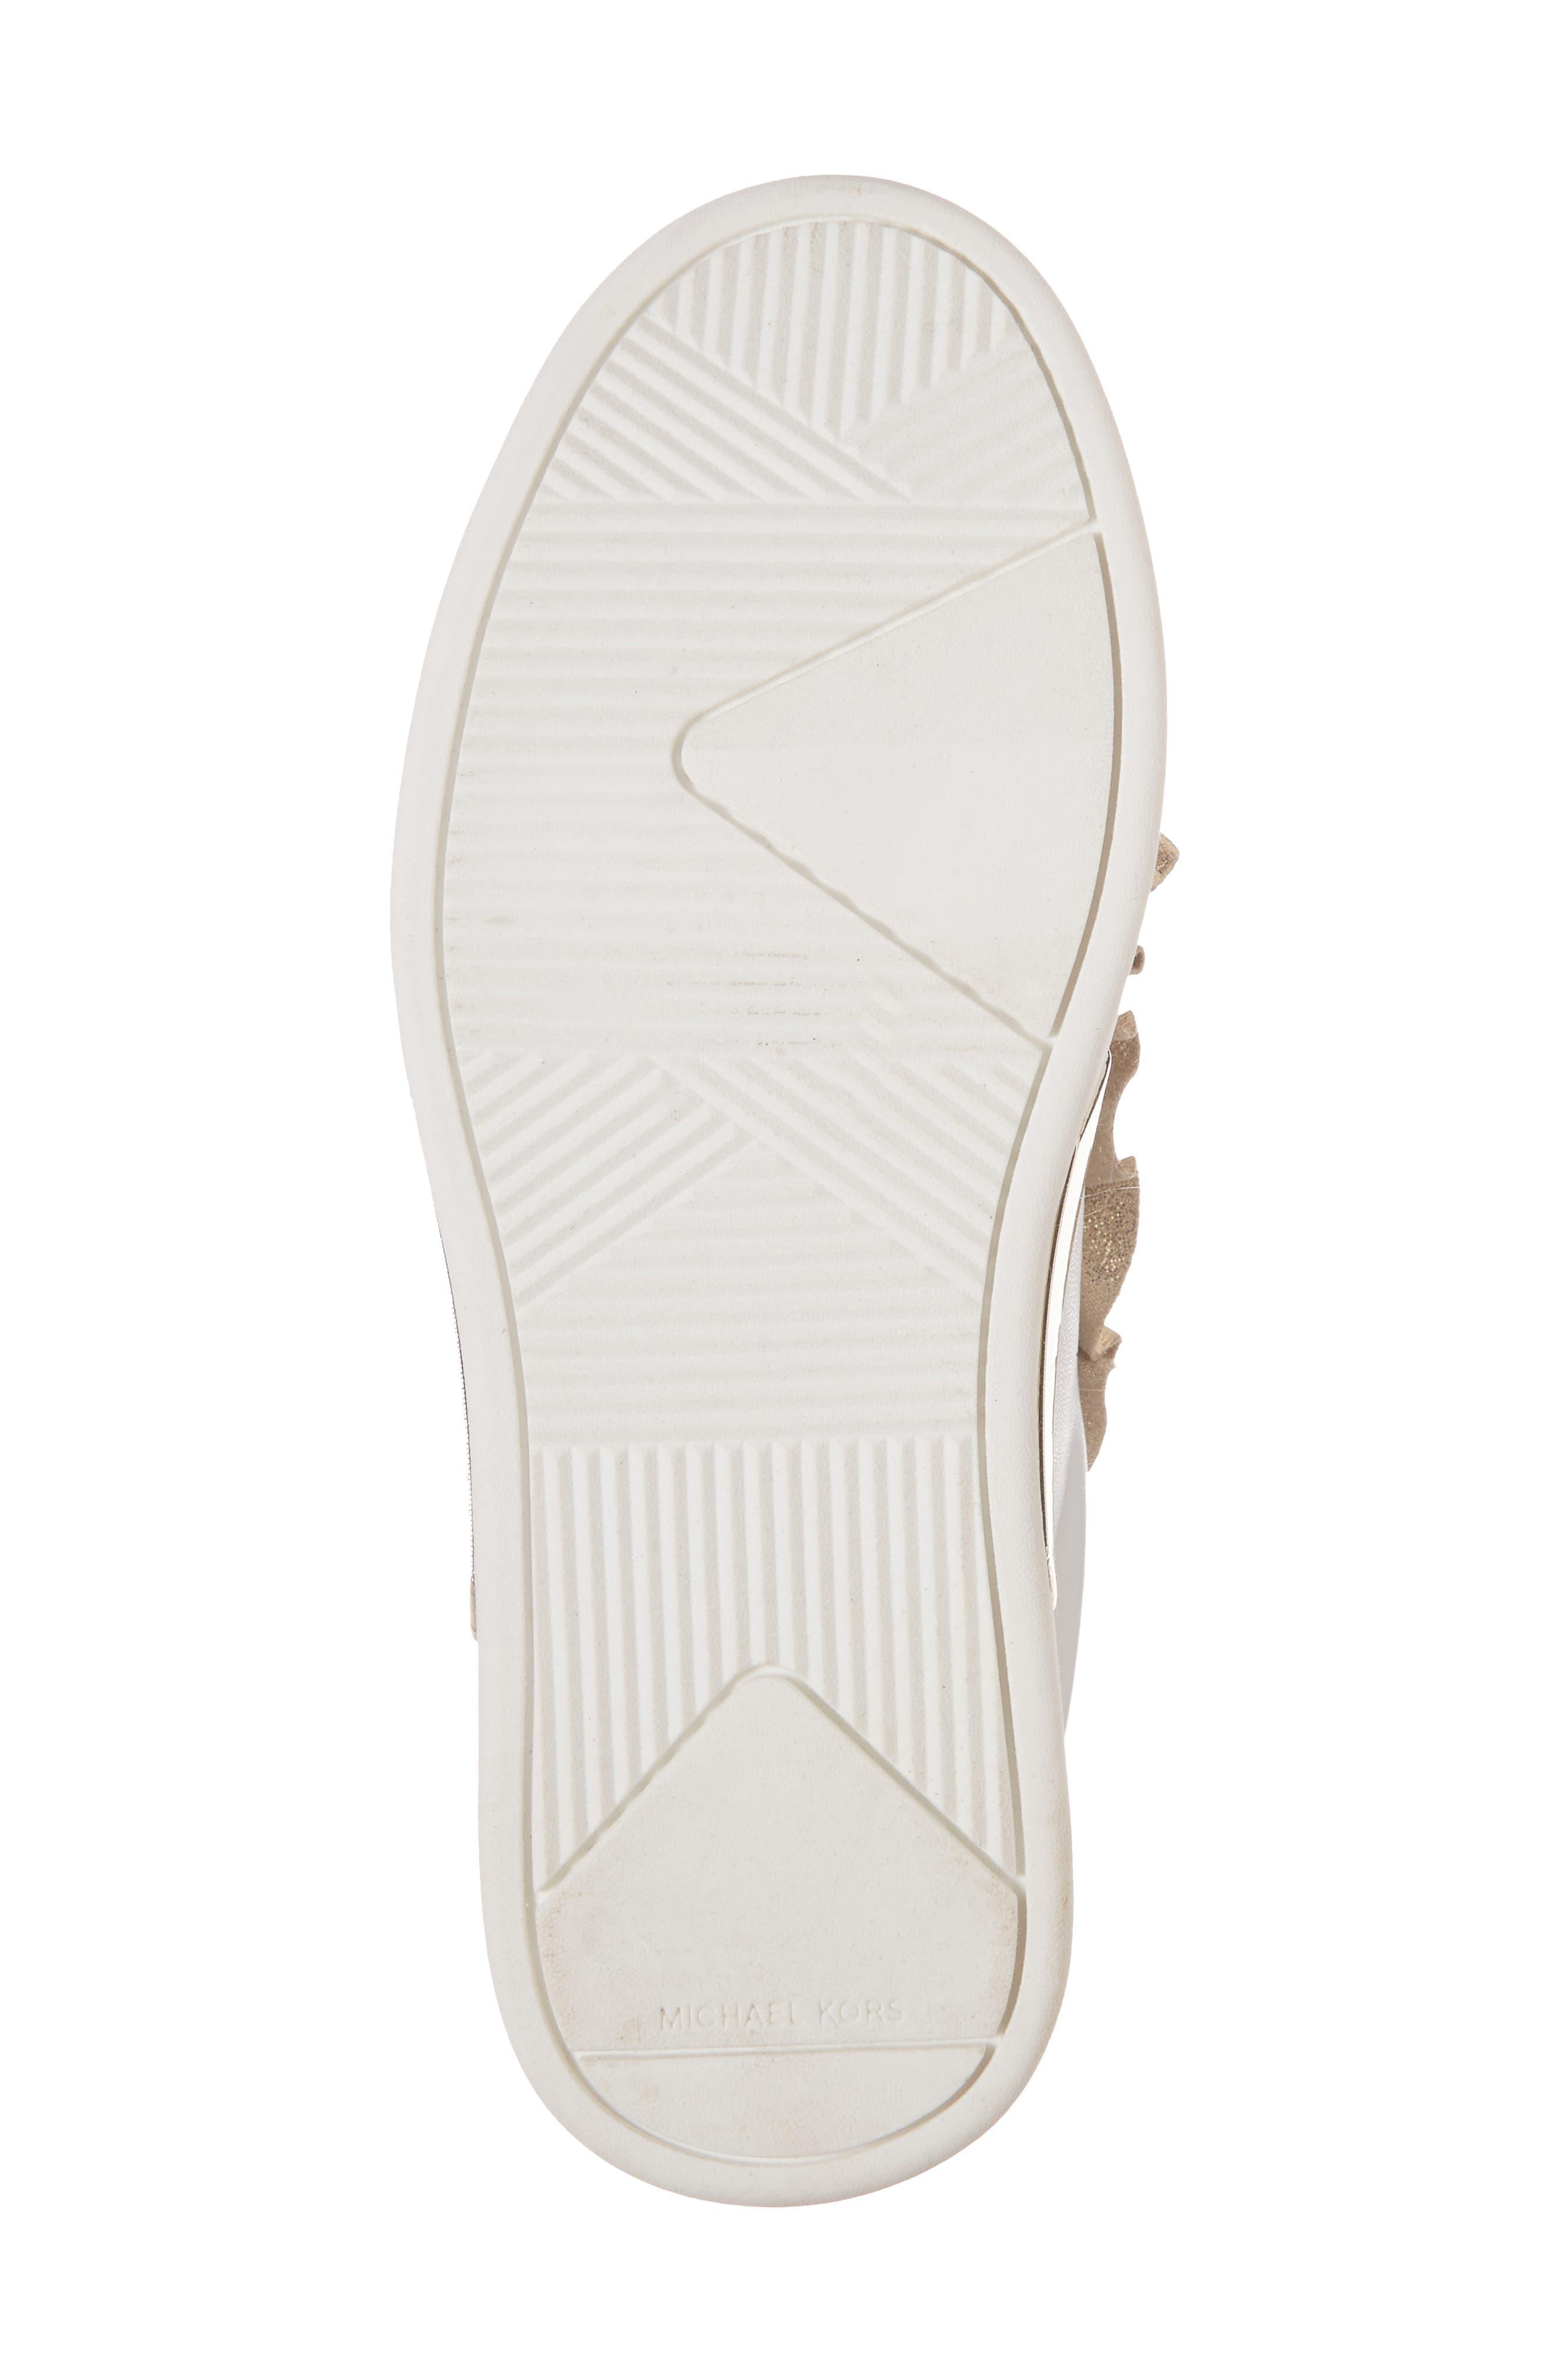 Guard Rail Sneaker,                             Alternate thumbnail 6, color,                             White